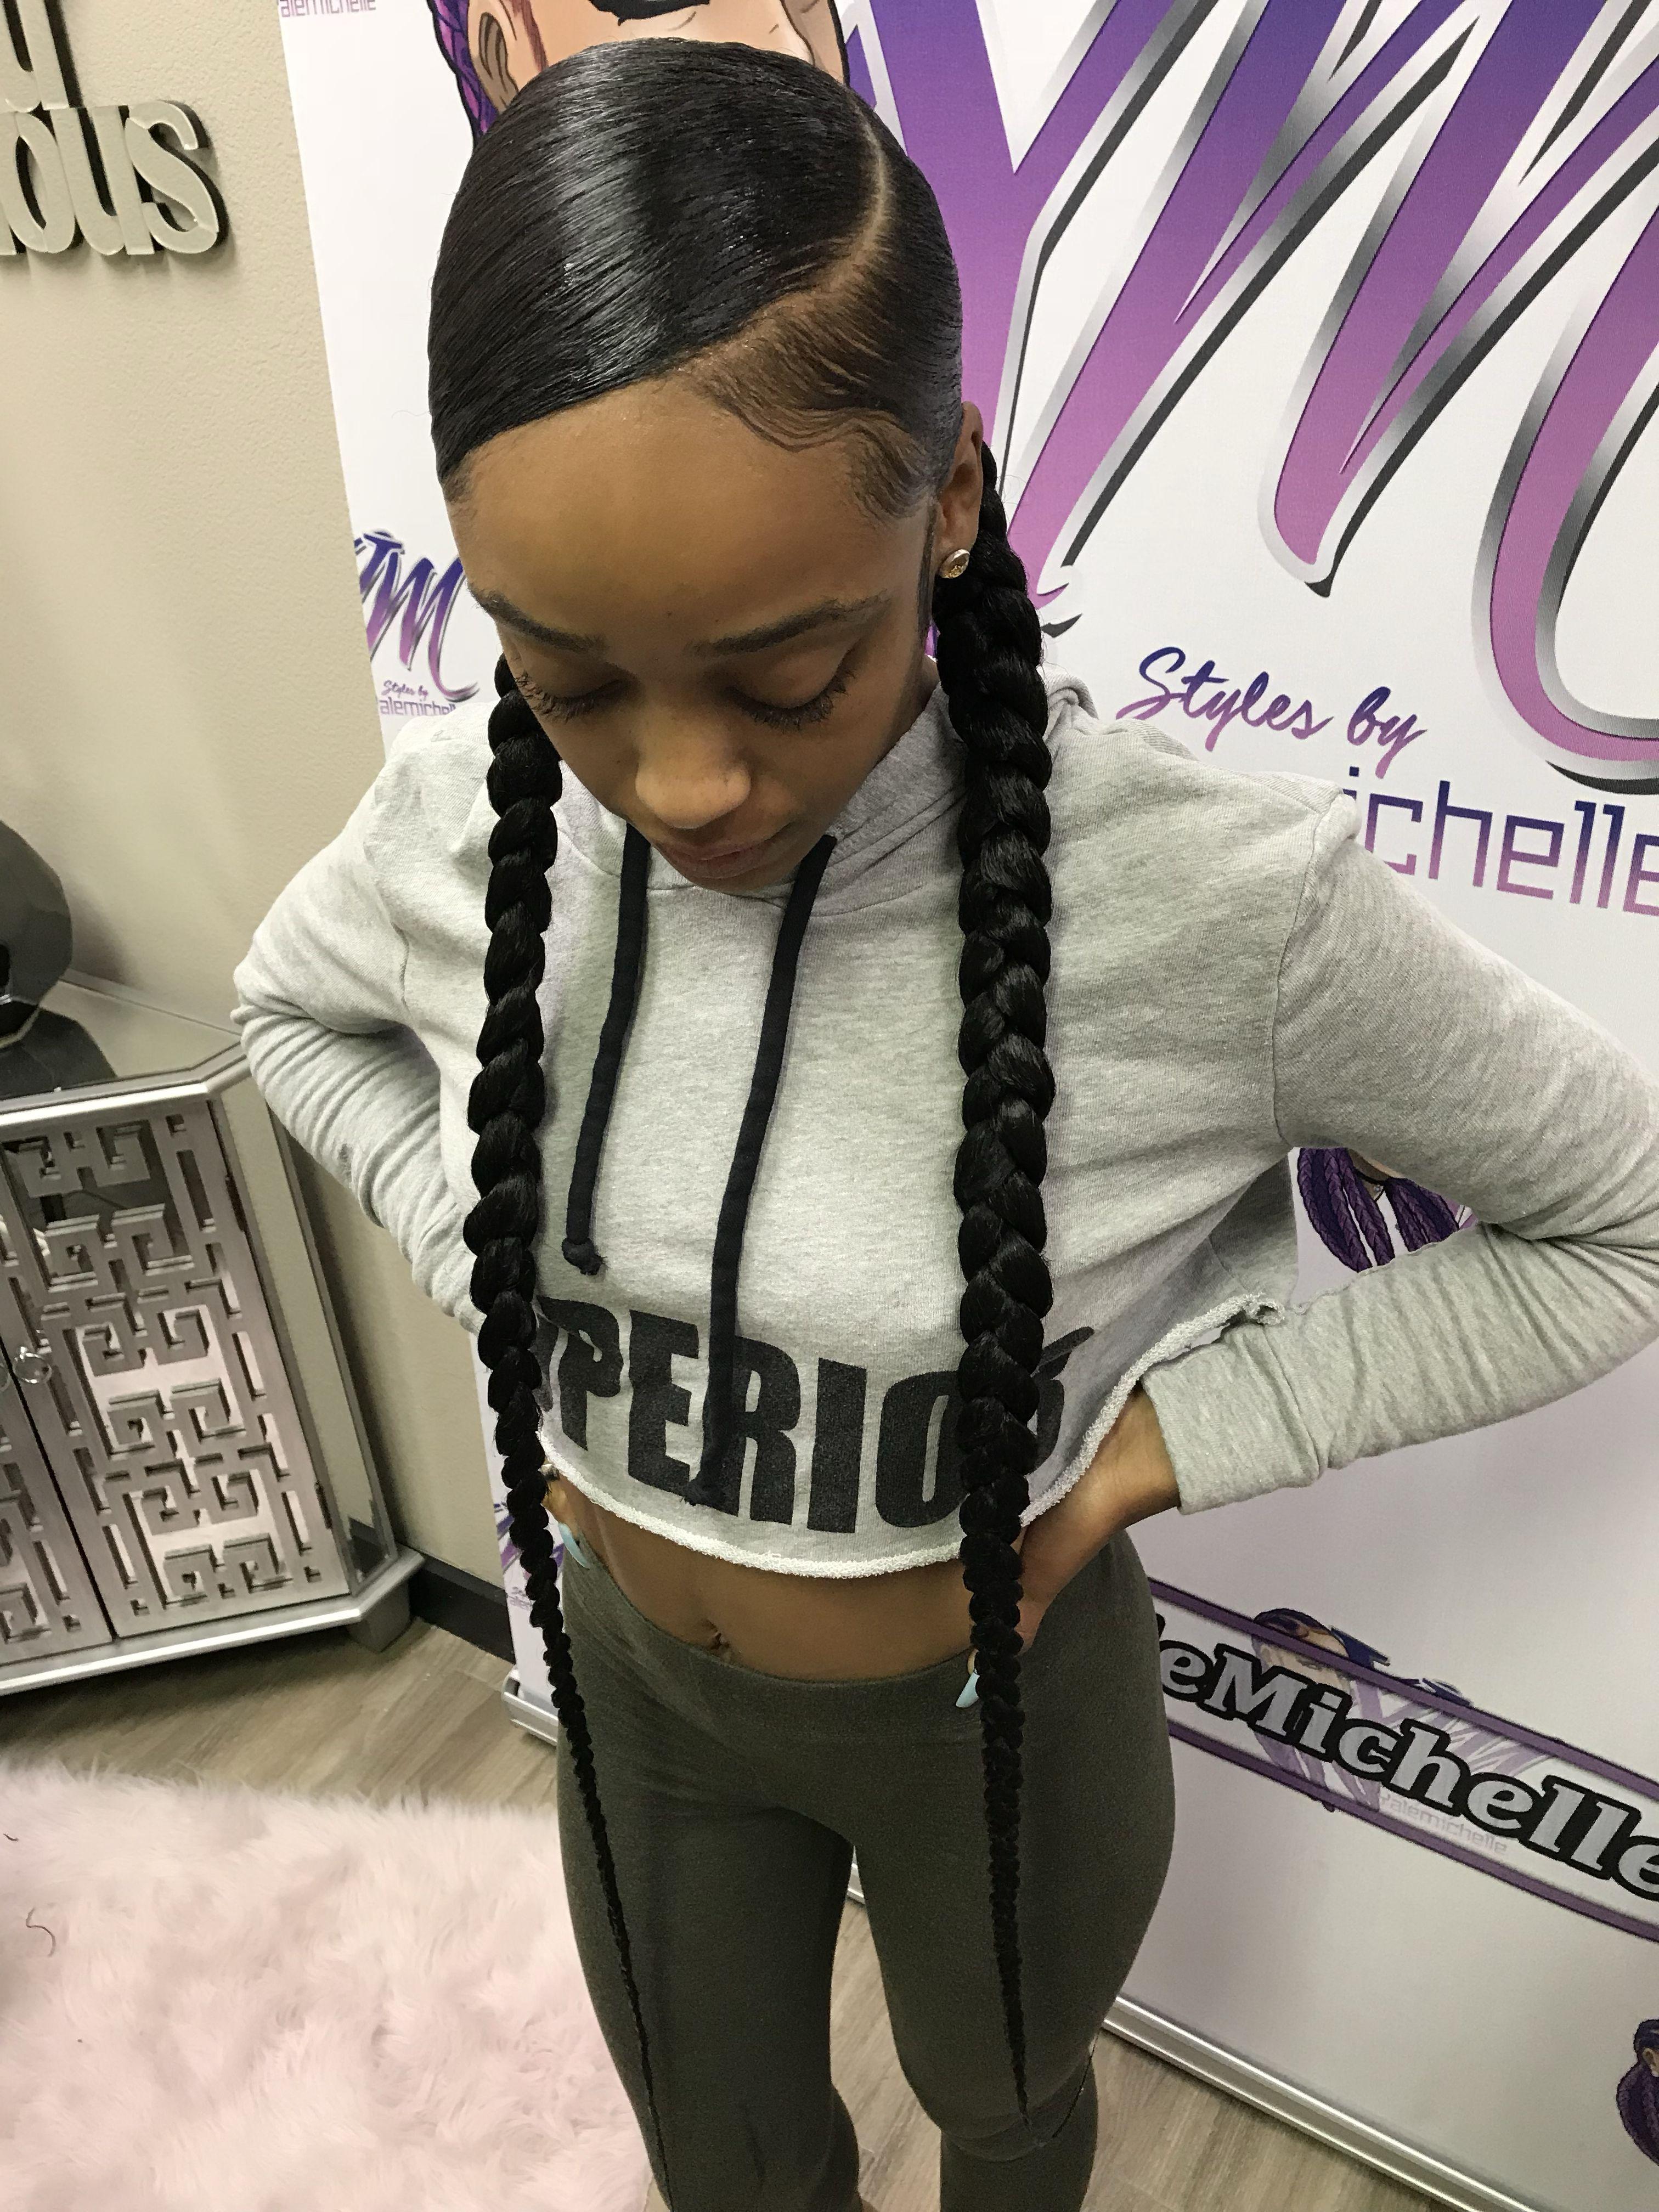 2 Ponytails Black Girl Braided Hairstyles Sleek Braided Ponytail Hair Ponytail Styles